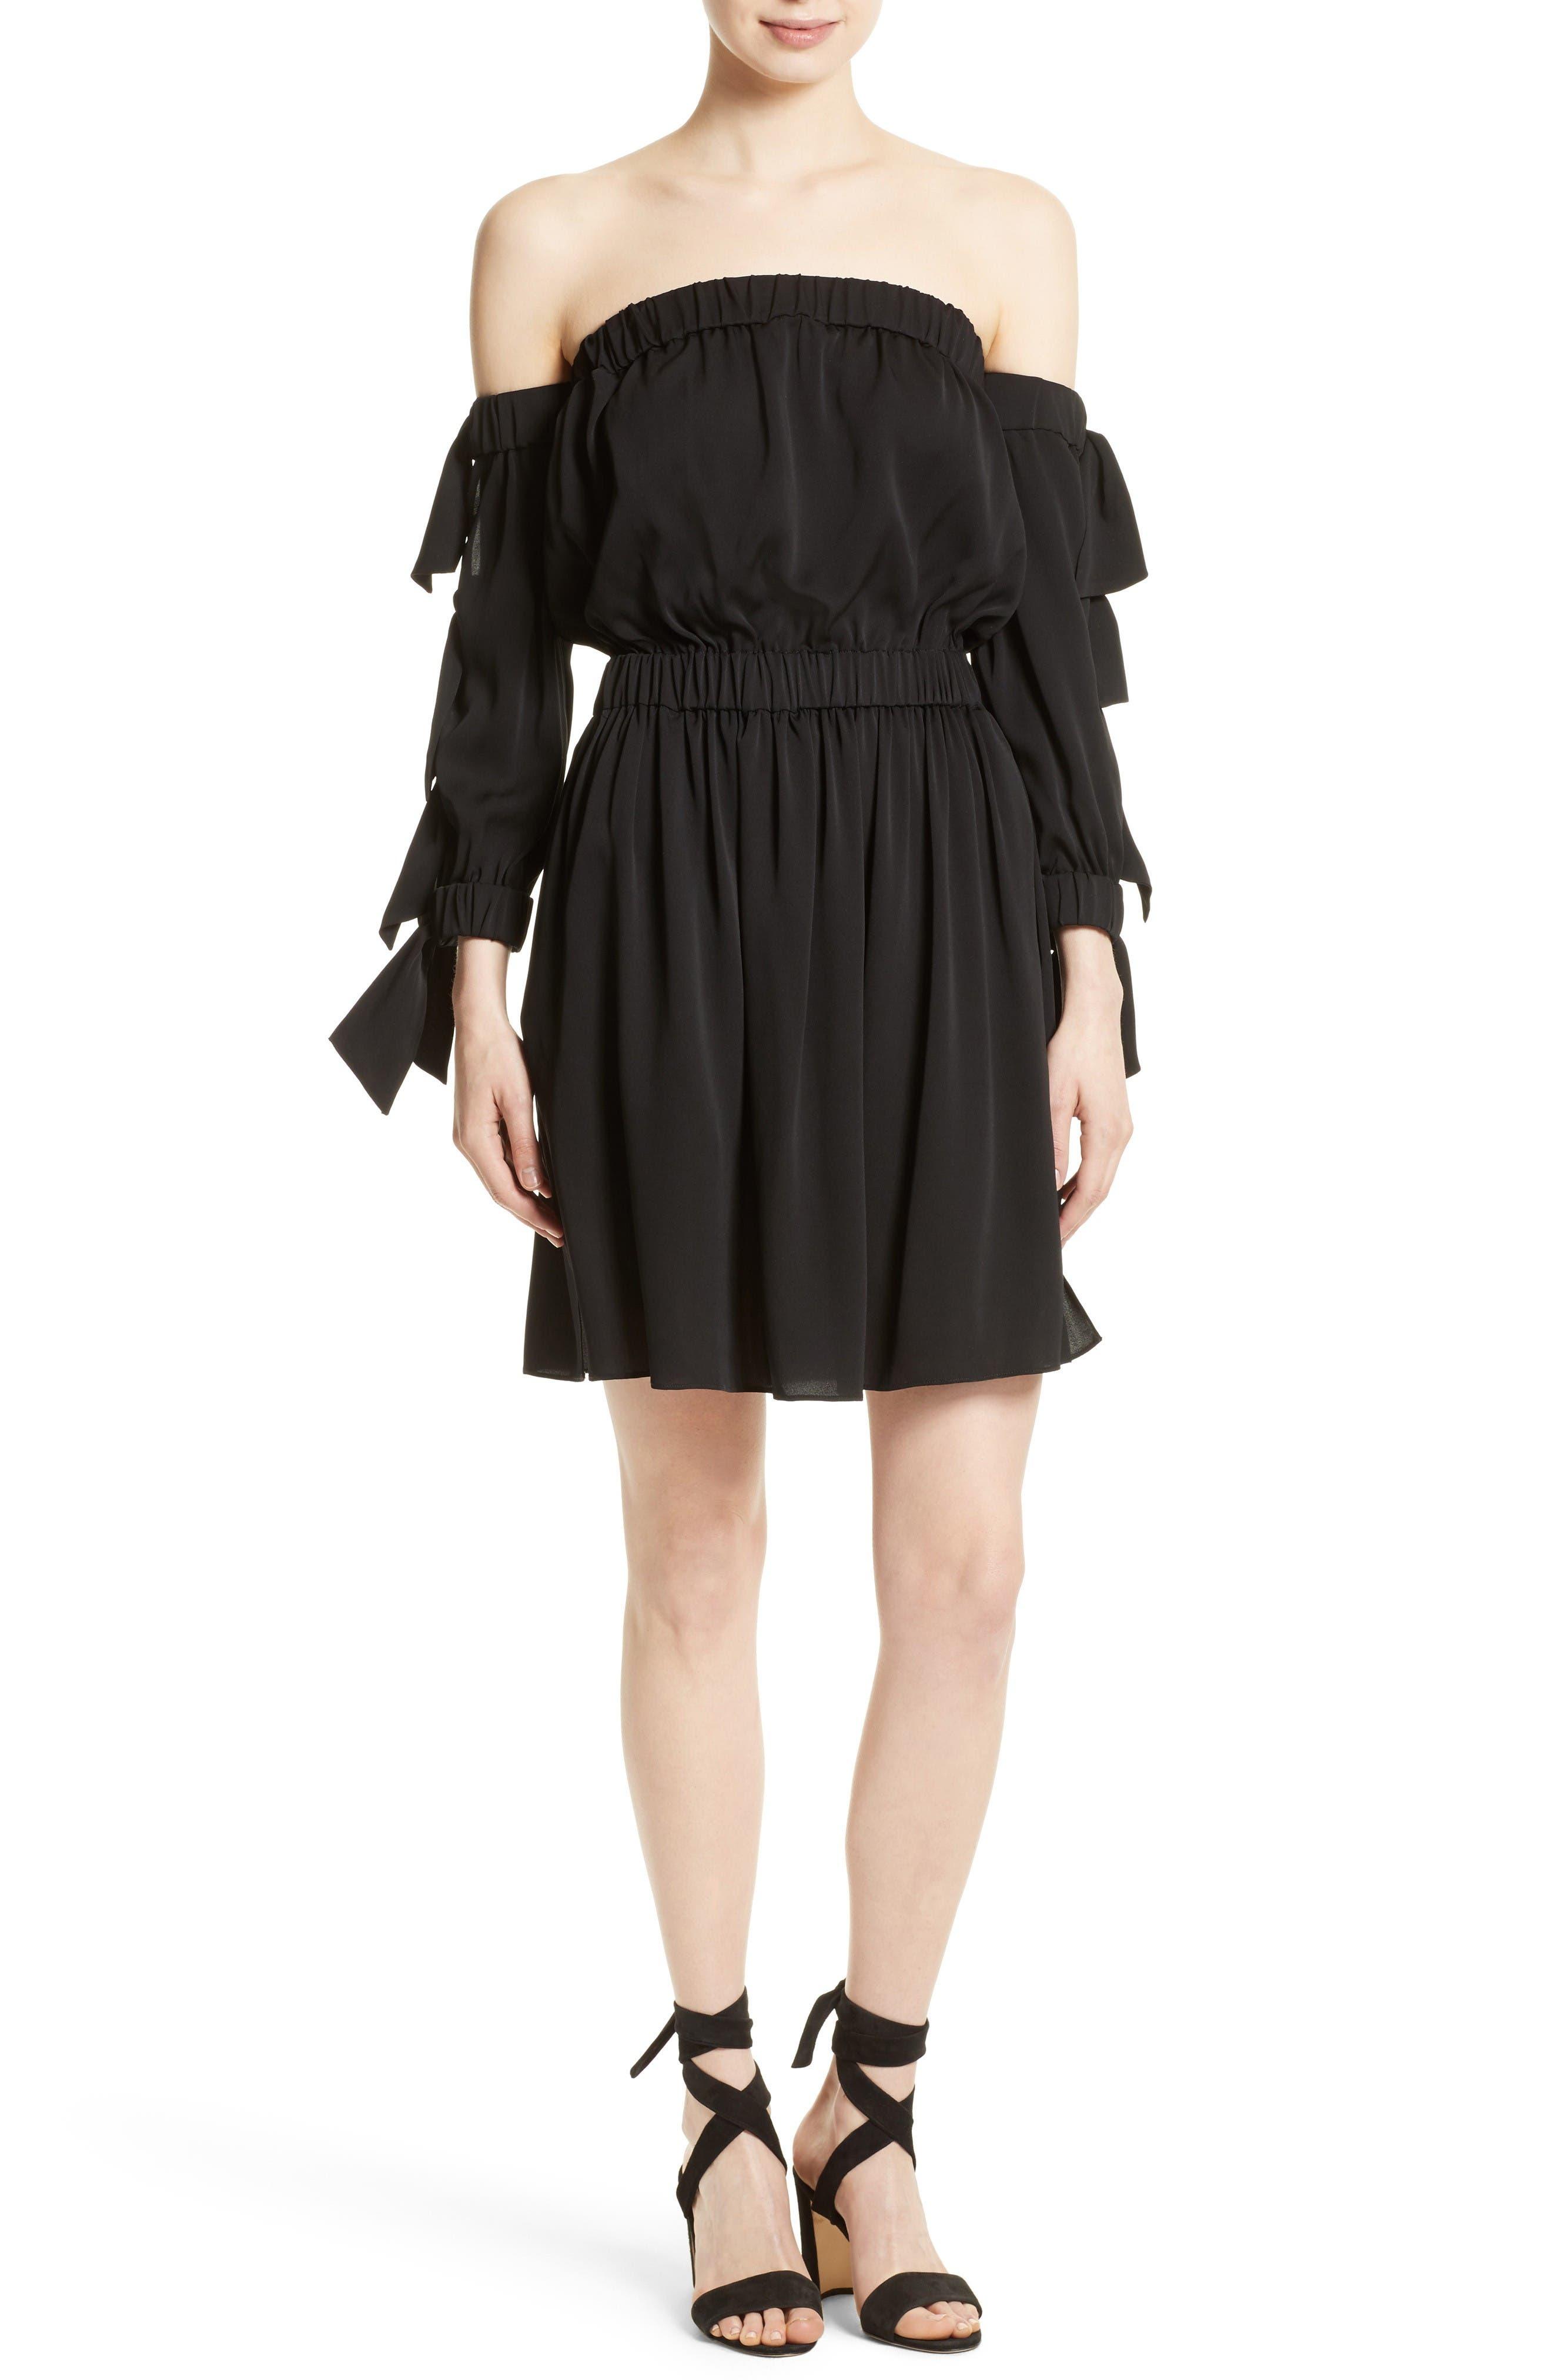 Milly Jillian Stretch Silk Off the Shoulder Dress